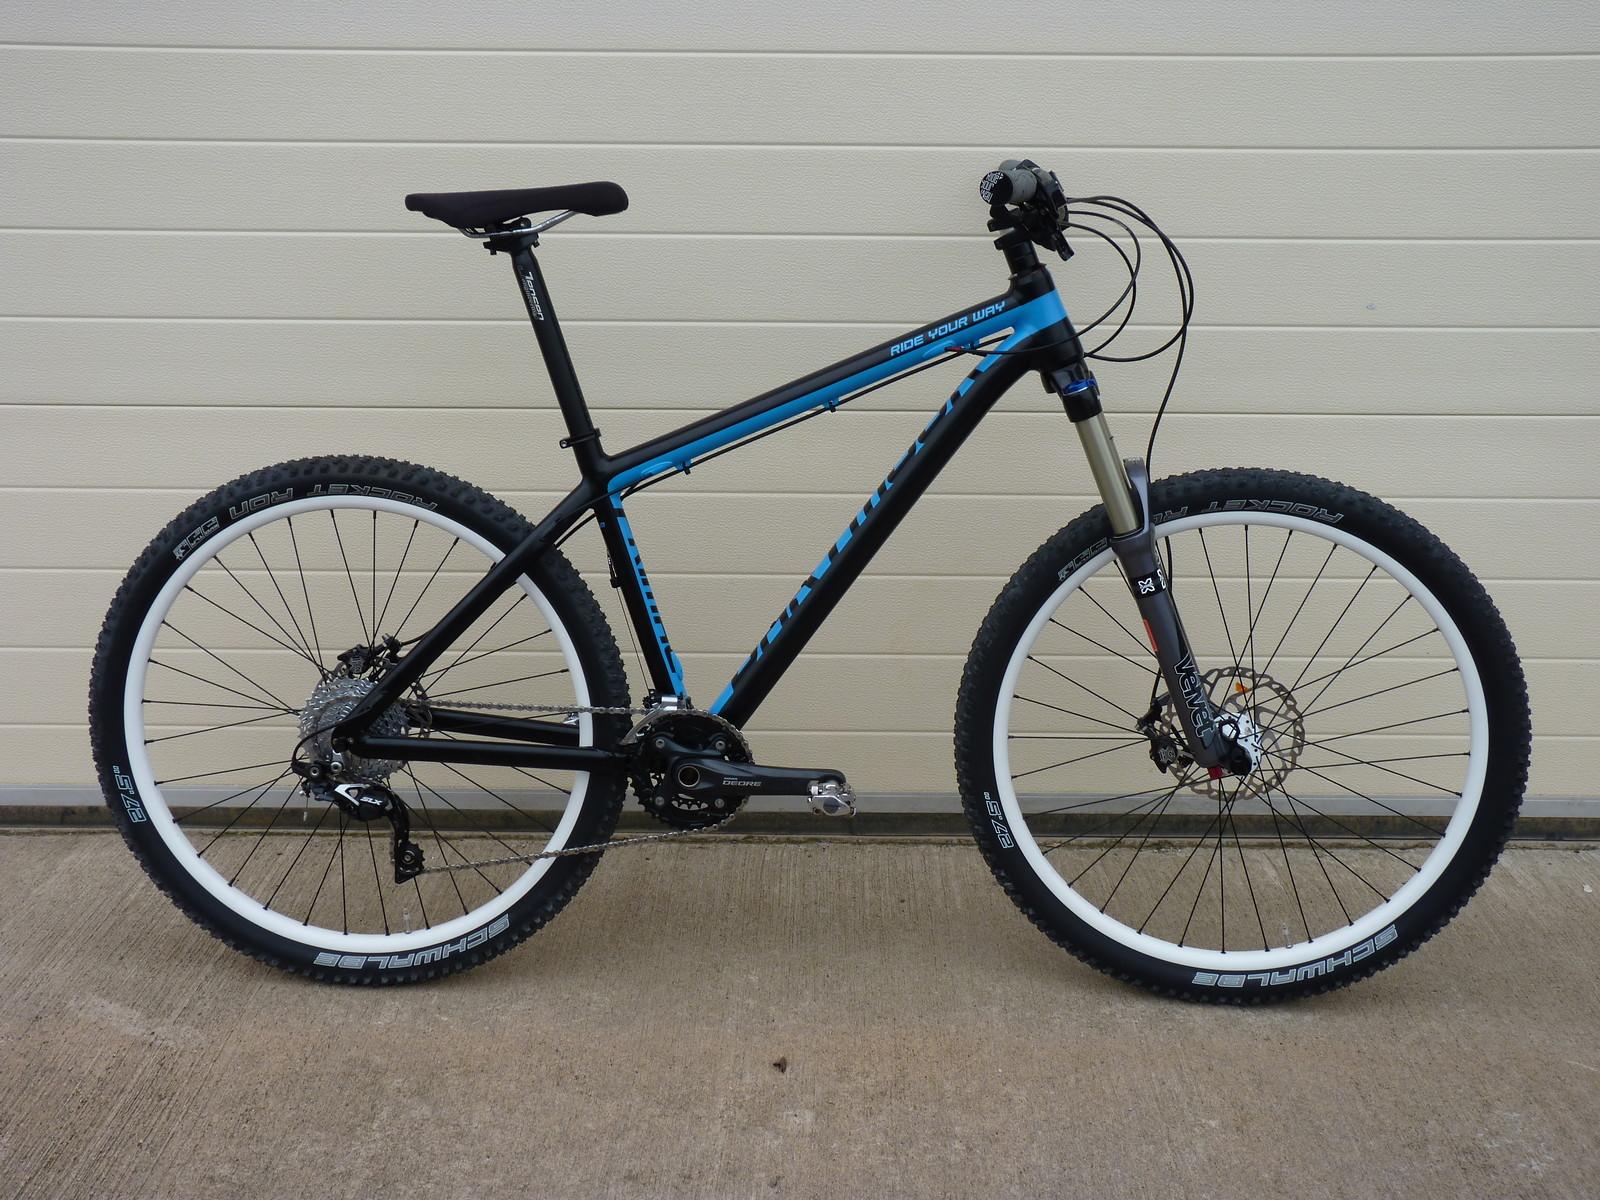 Dartmoor Primal 4X Bike - Dartmoor Bikes - Mountain Biking Pictures - Vital MTB